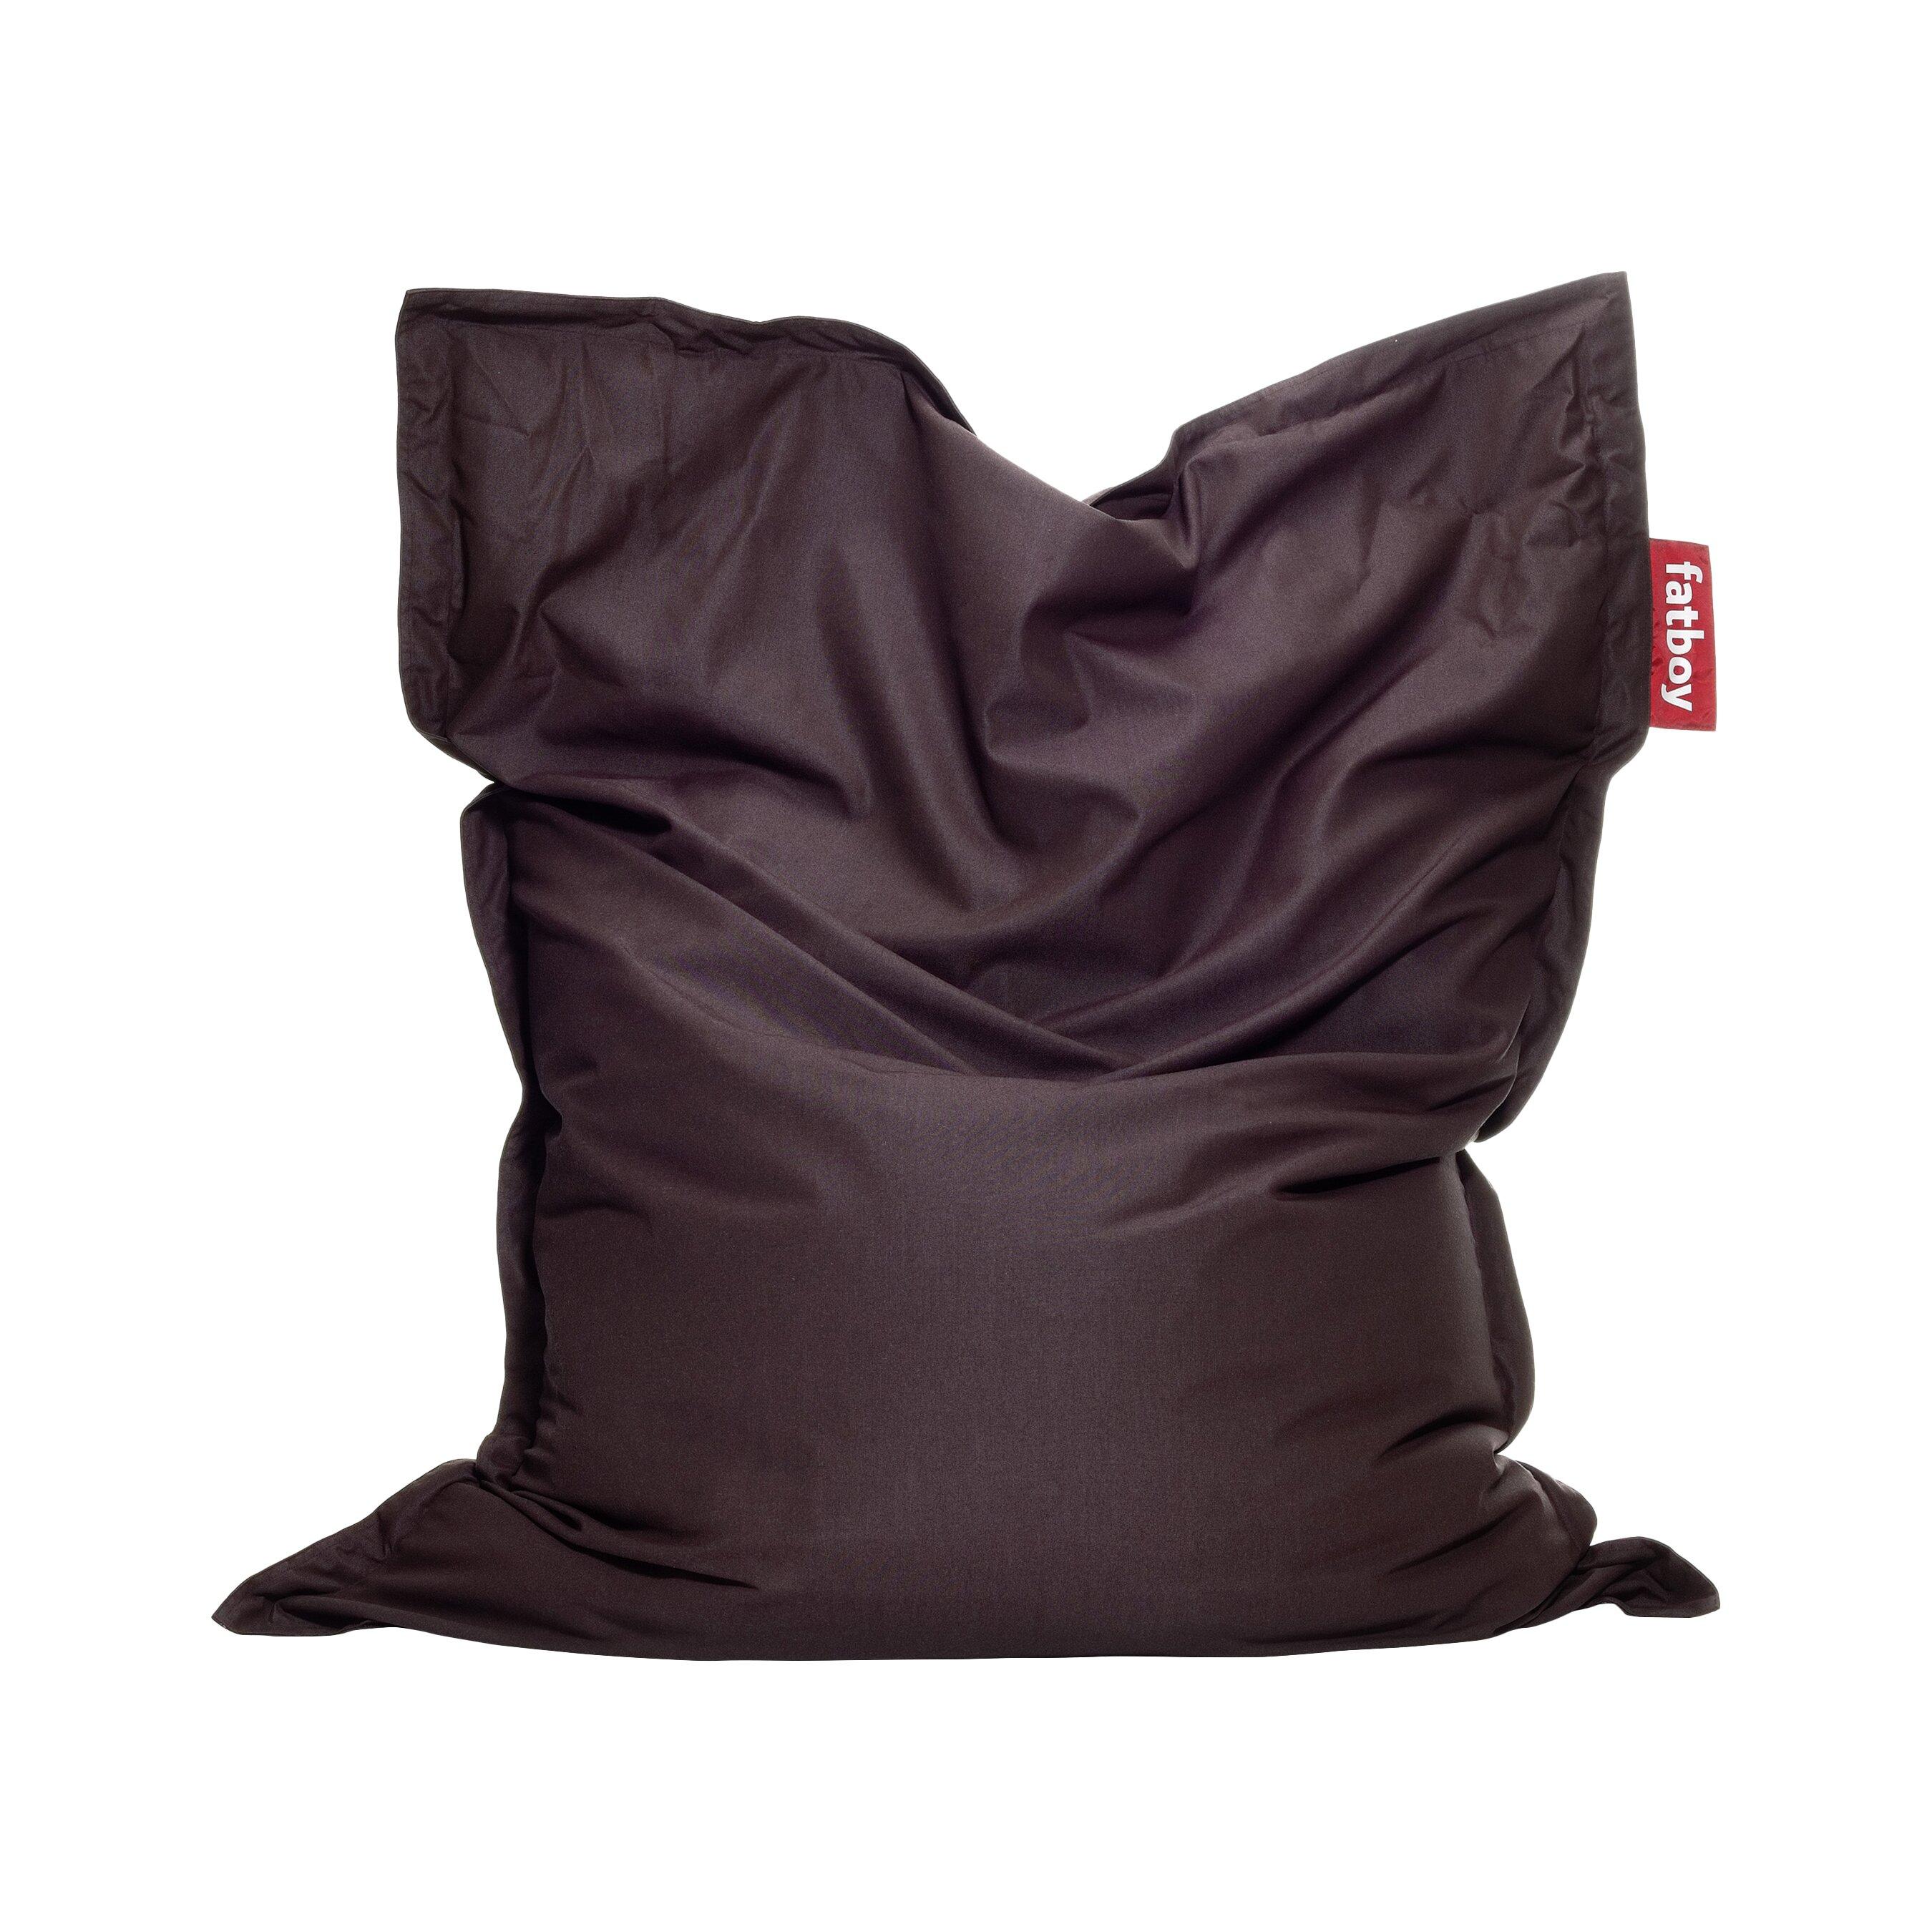 fatboy original outdoor bean bag lounger reviews wayfair. Black Bedroom Furniture Sets. Home Design Ideas